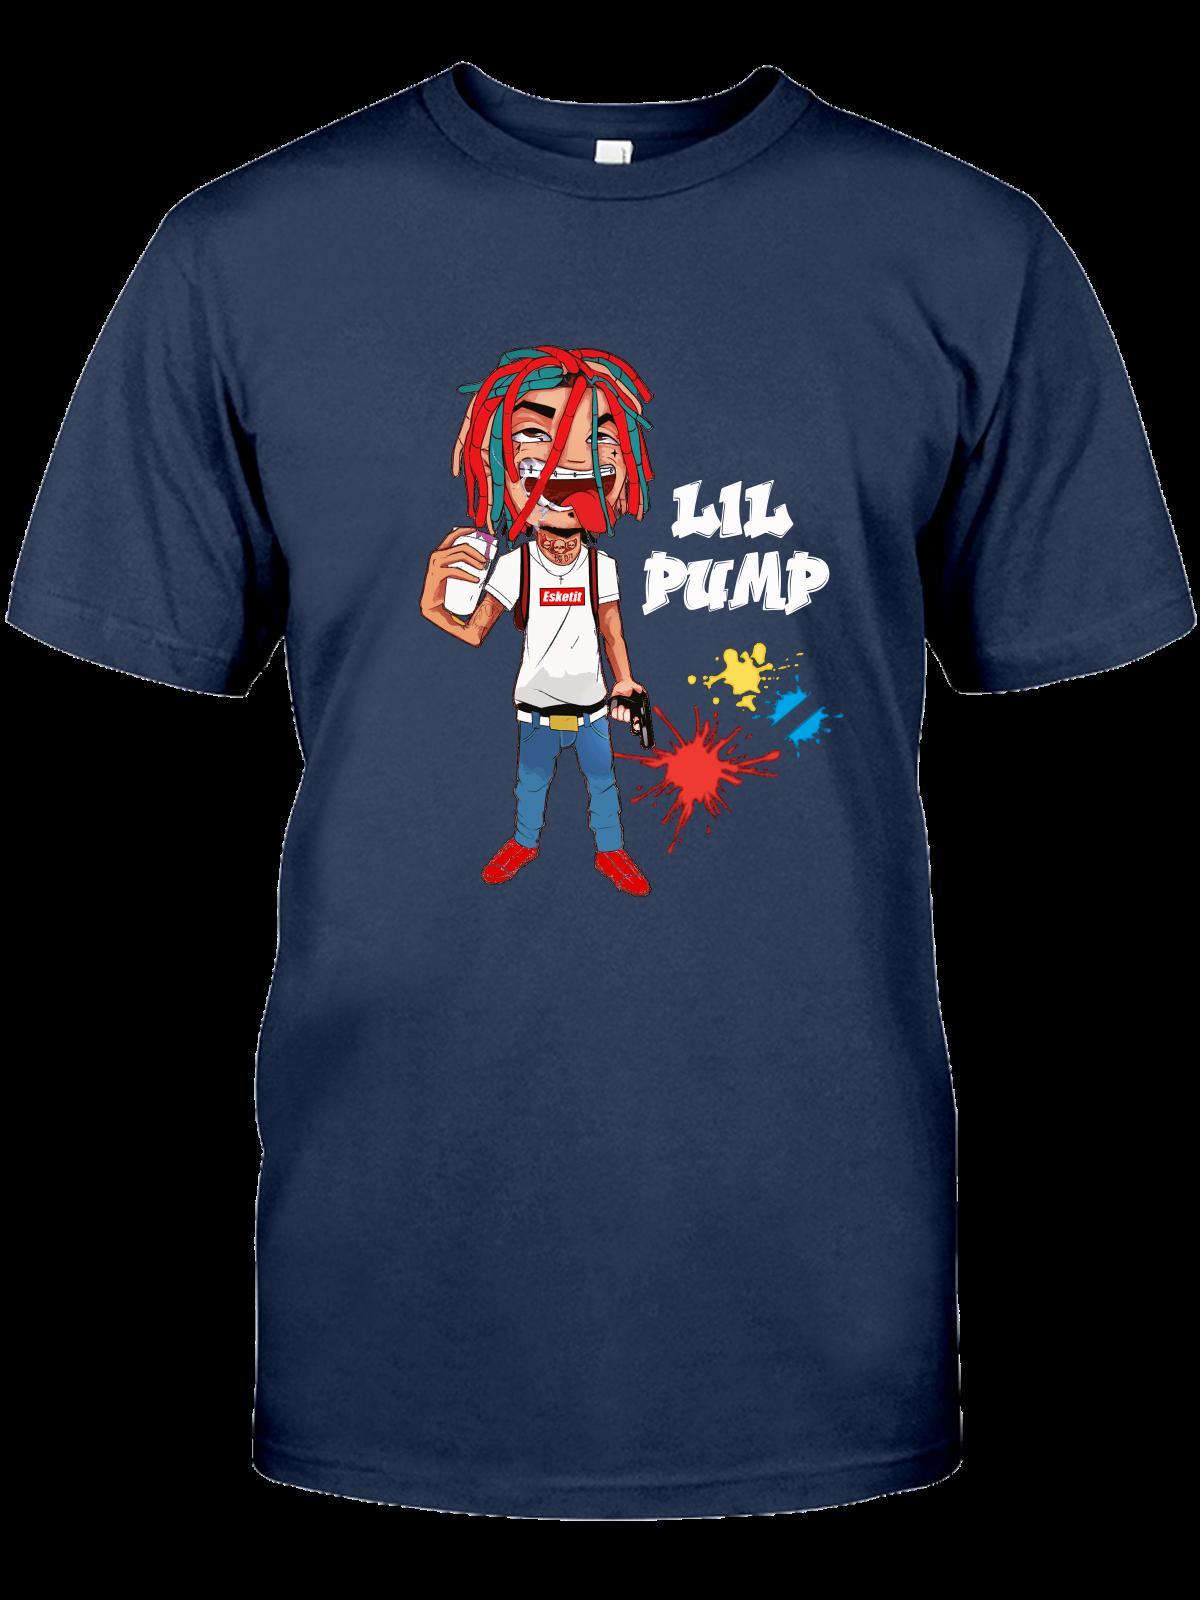 78fc5a79f35 Lil Pump T Shirt Esskeetit Money Rap Singer Hip Hop Music Men S T Shirt.00  Mens Pride Dark T Shirt Suit Hat Pink T Shirt Designer Mens T Shirt Really  Cool ...